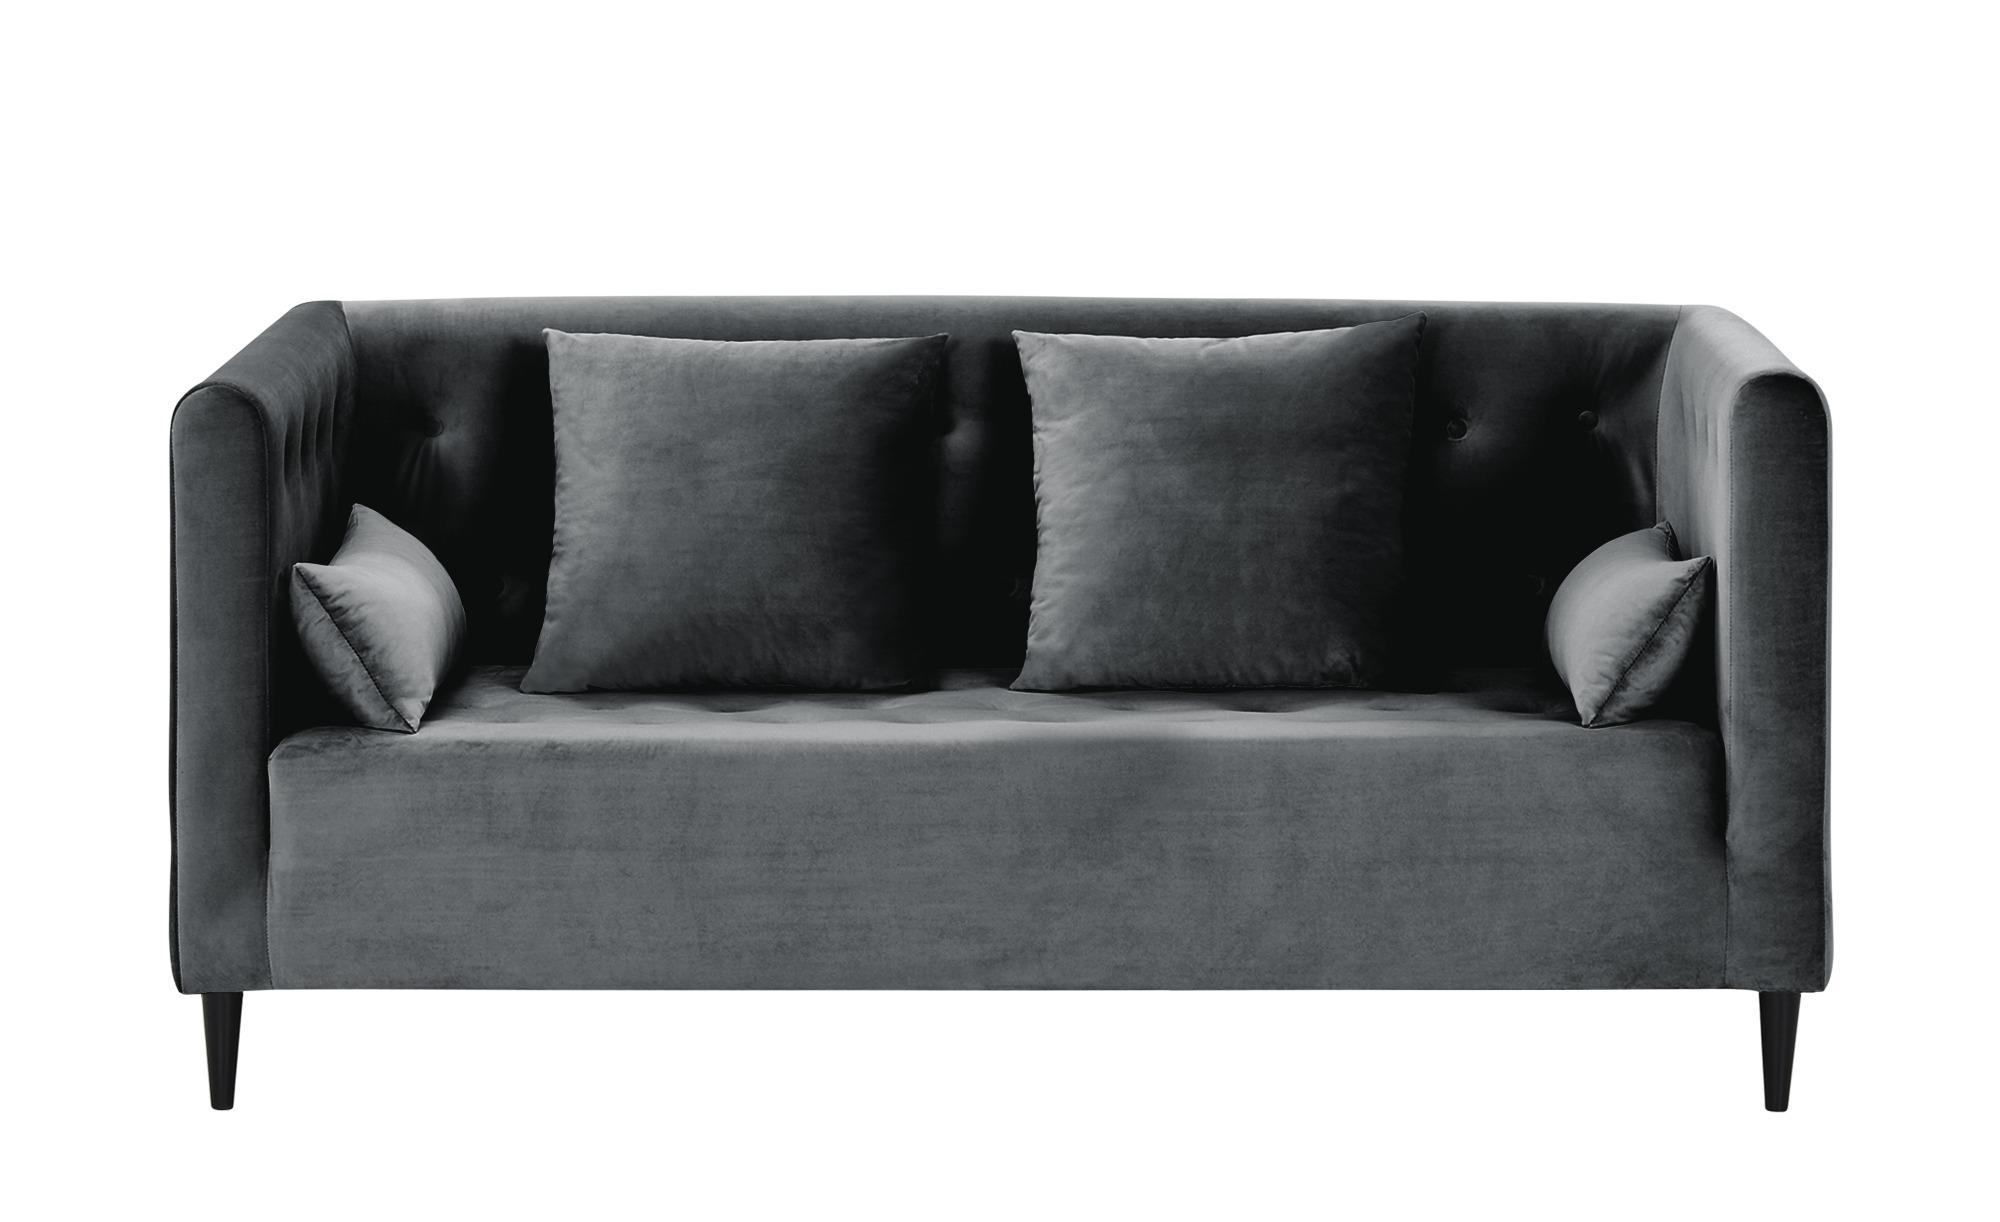 smart Sofa  Neea ¦ grau ¦ Maße (cm): B: 181 H: 82 T: 88 Polstermöbel > Sofas > 2-Sitzer - Höffner